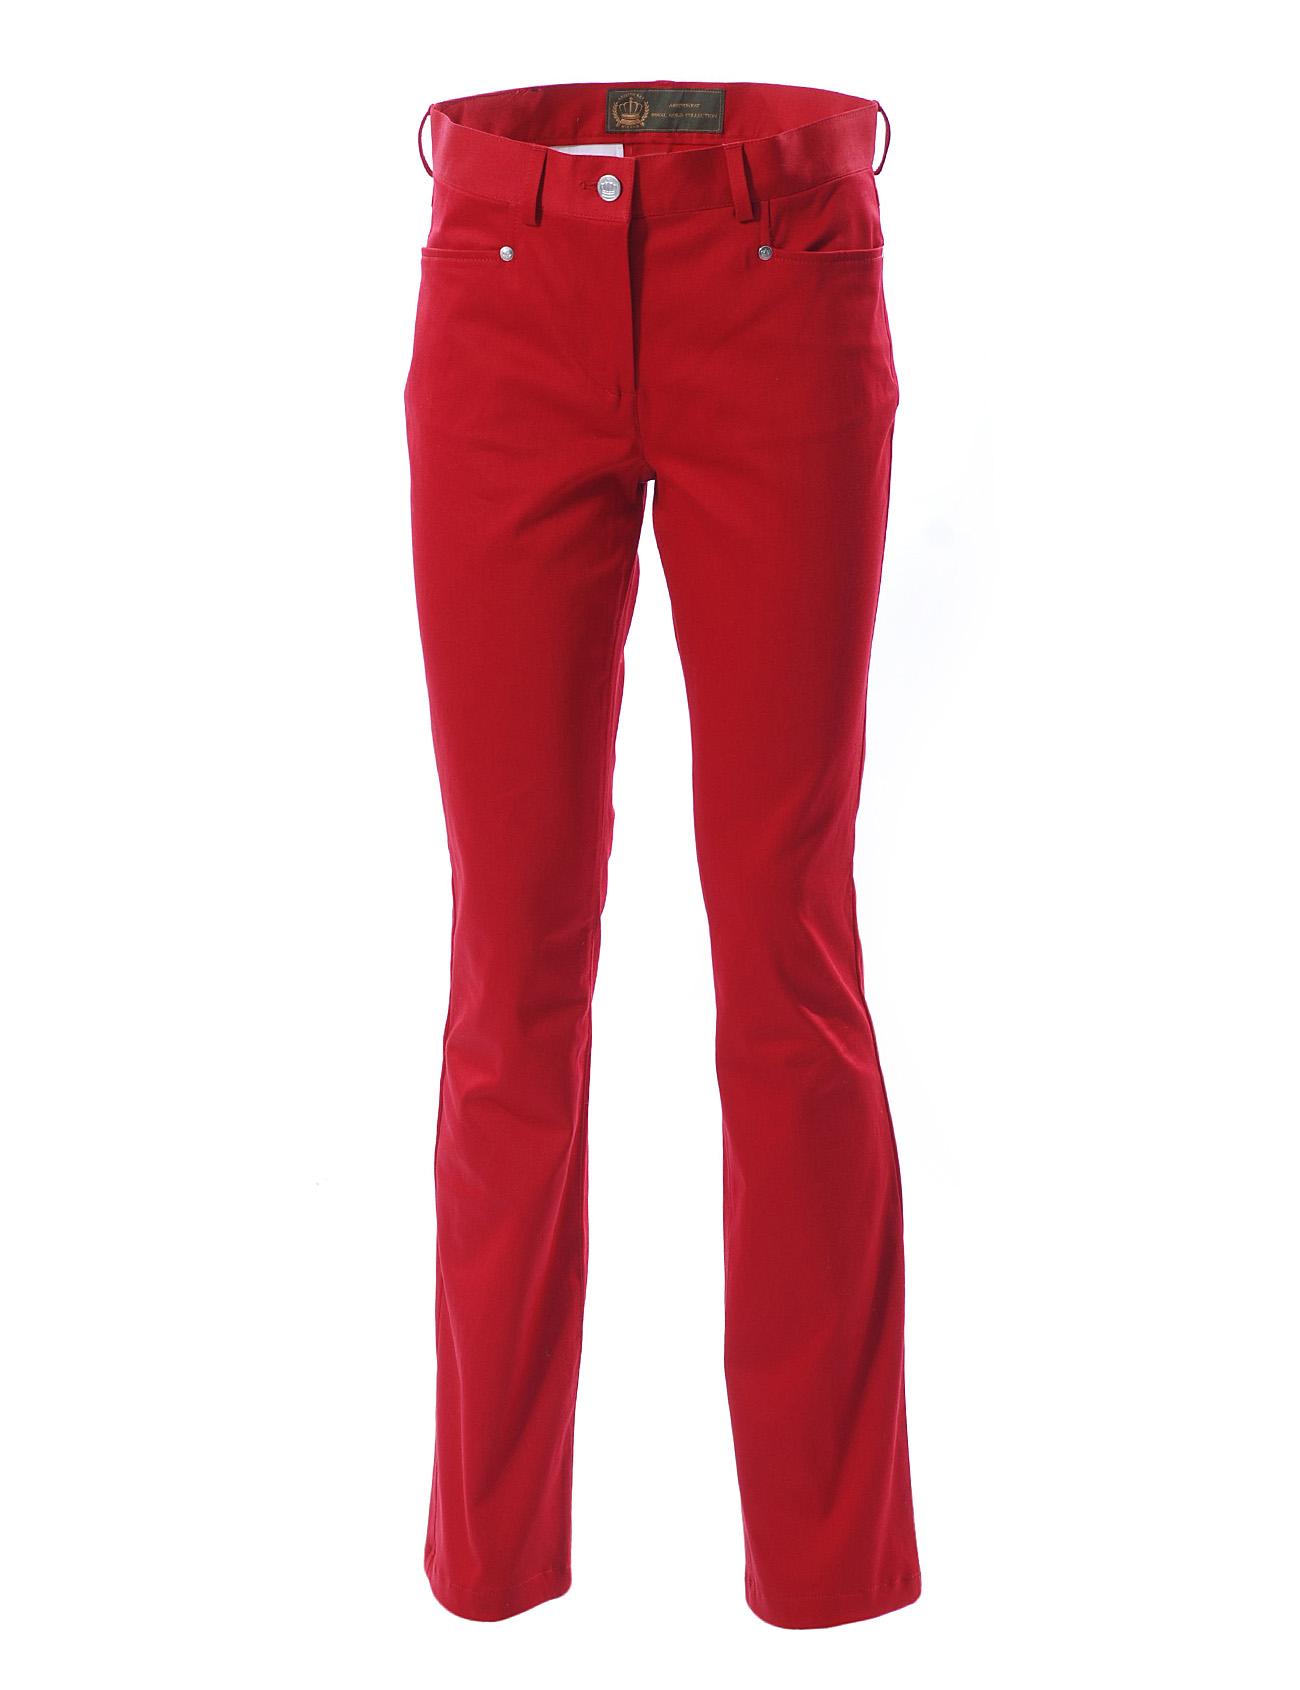 Brilliant FDJ French Dressing PullOn Pants  Straight Leg For Women In Indigo